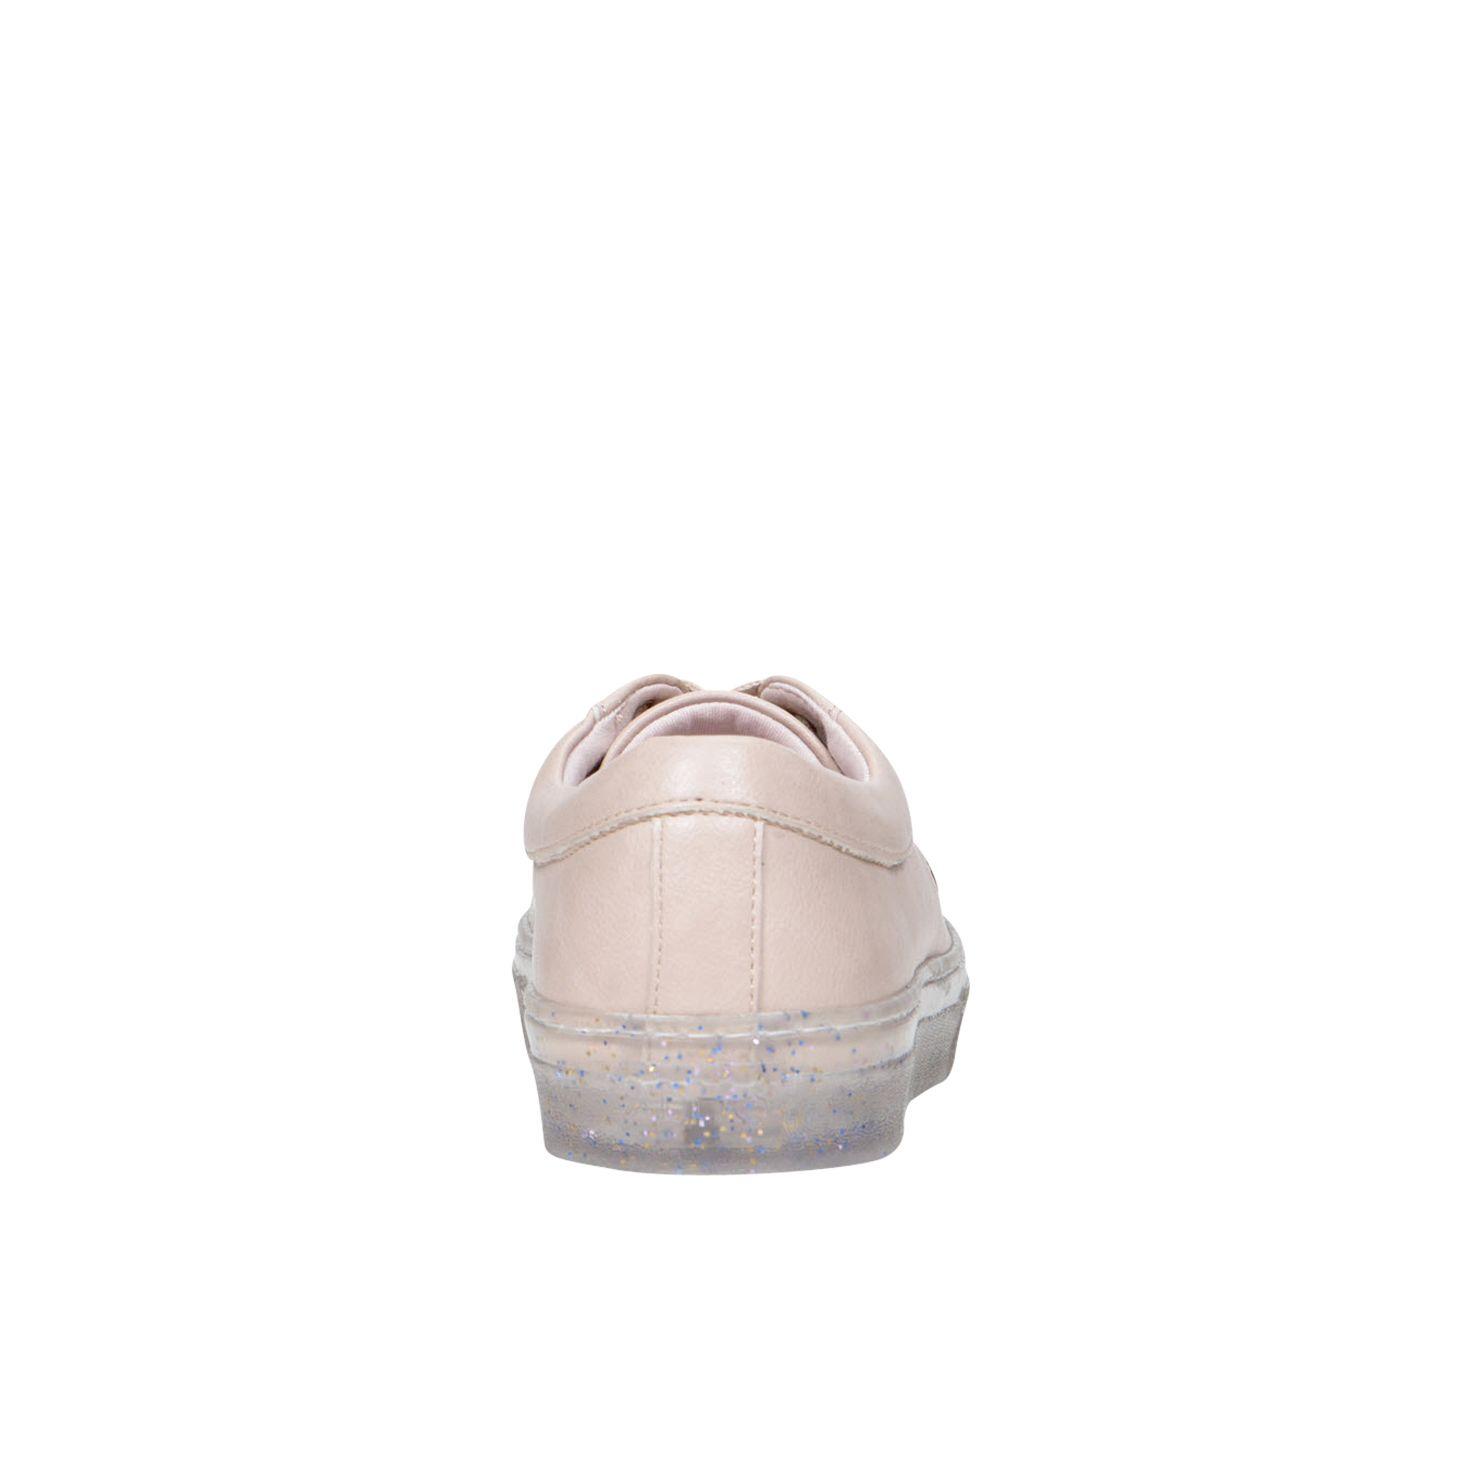 ALDO Legilini Lace Up Trainers in Bone (Pink)